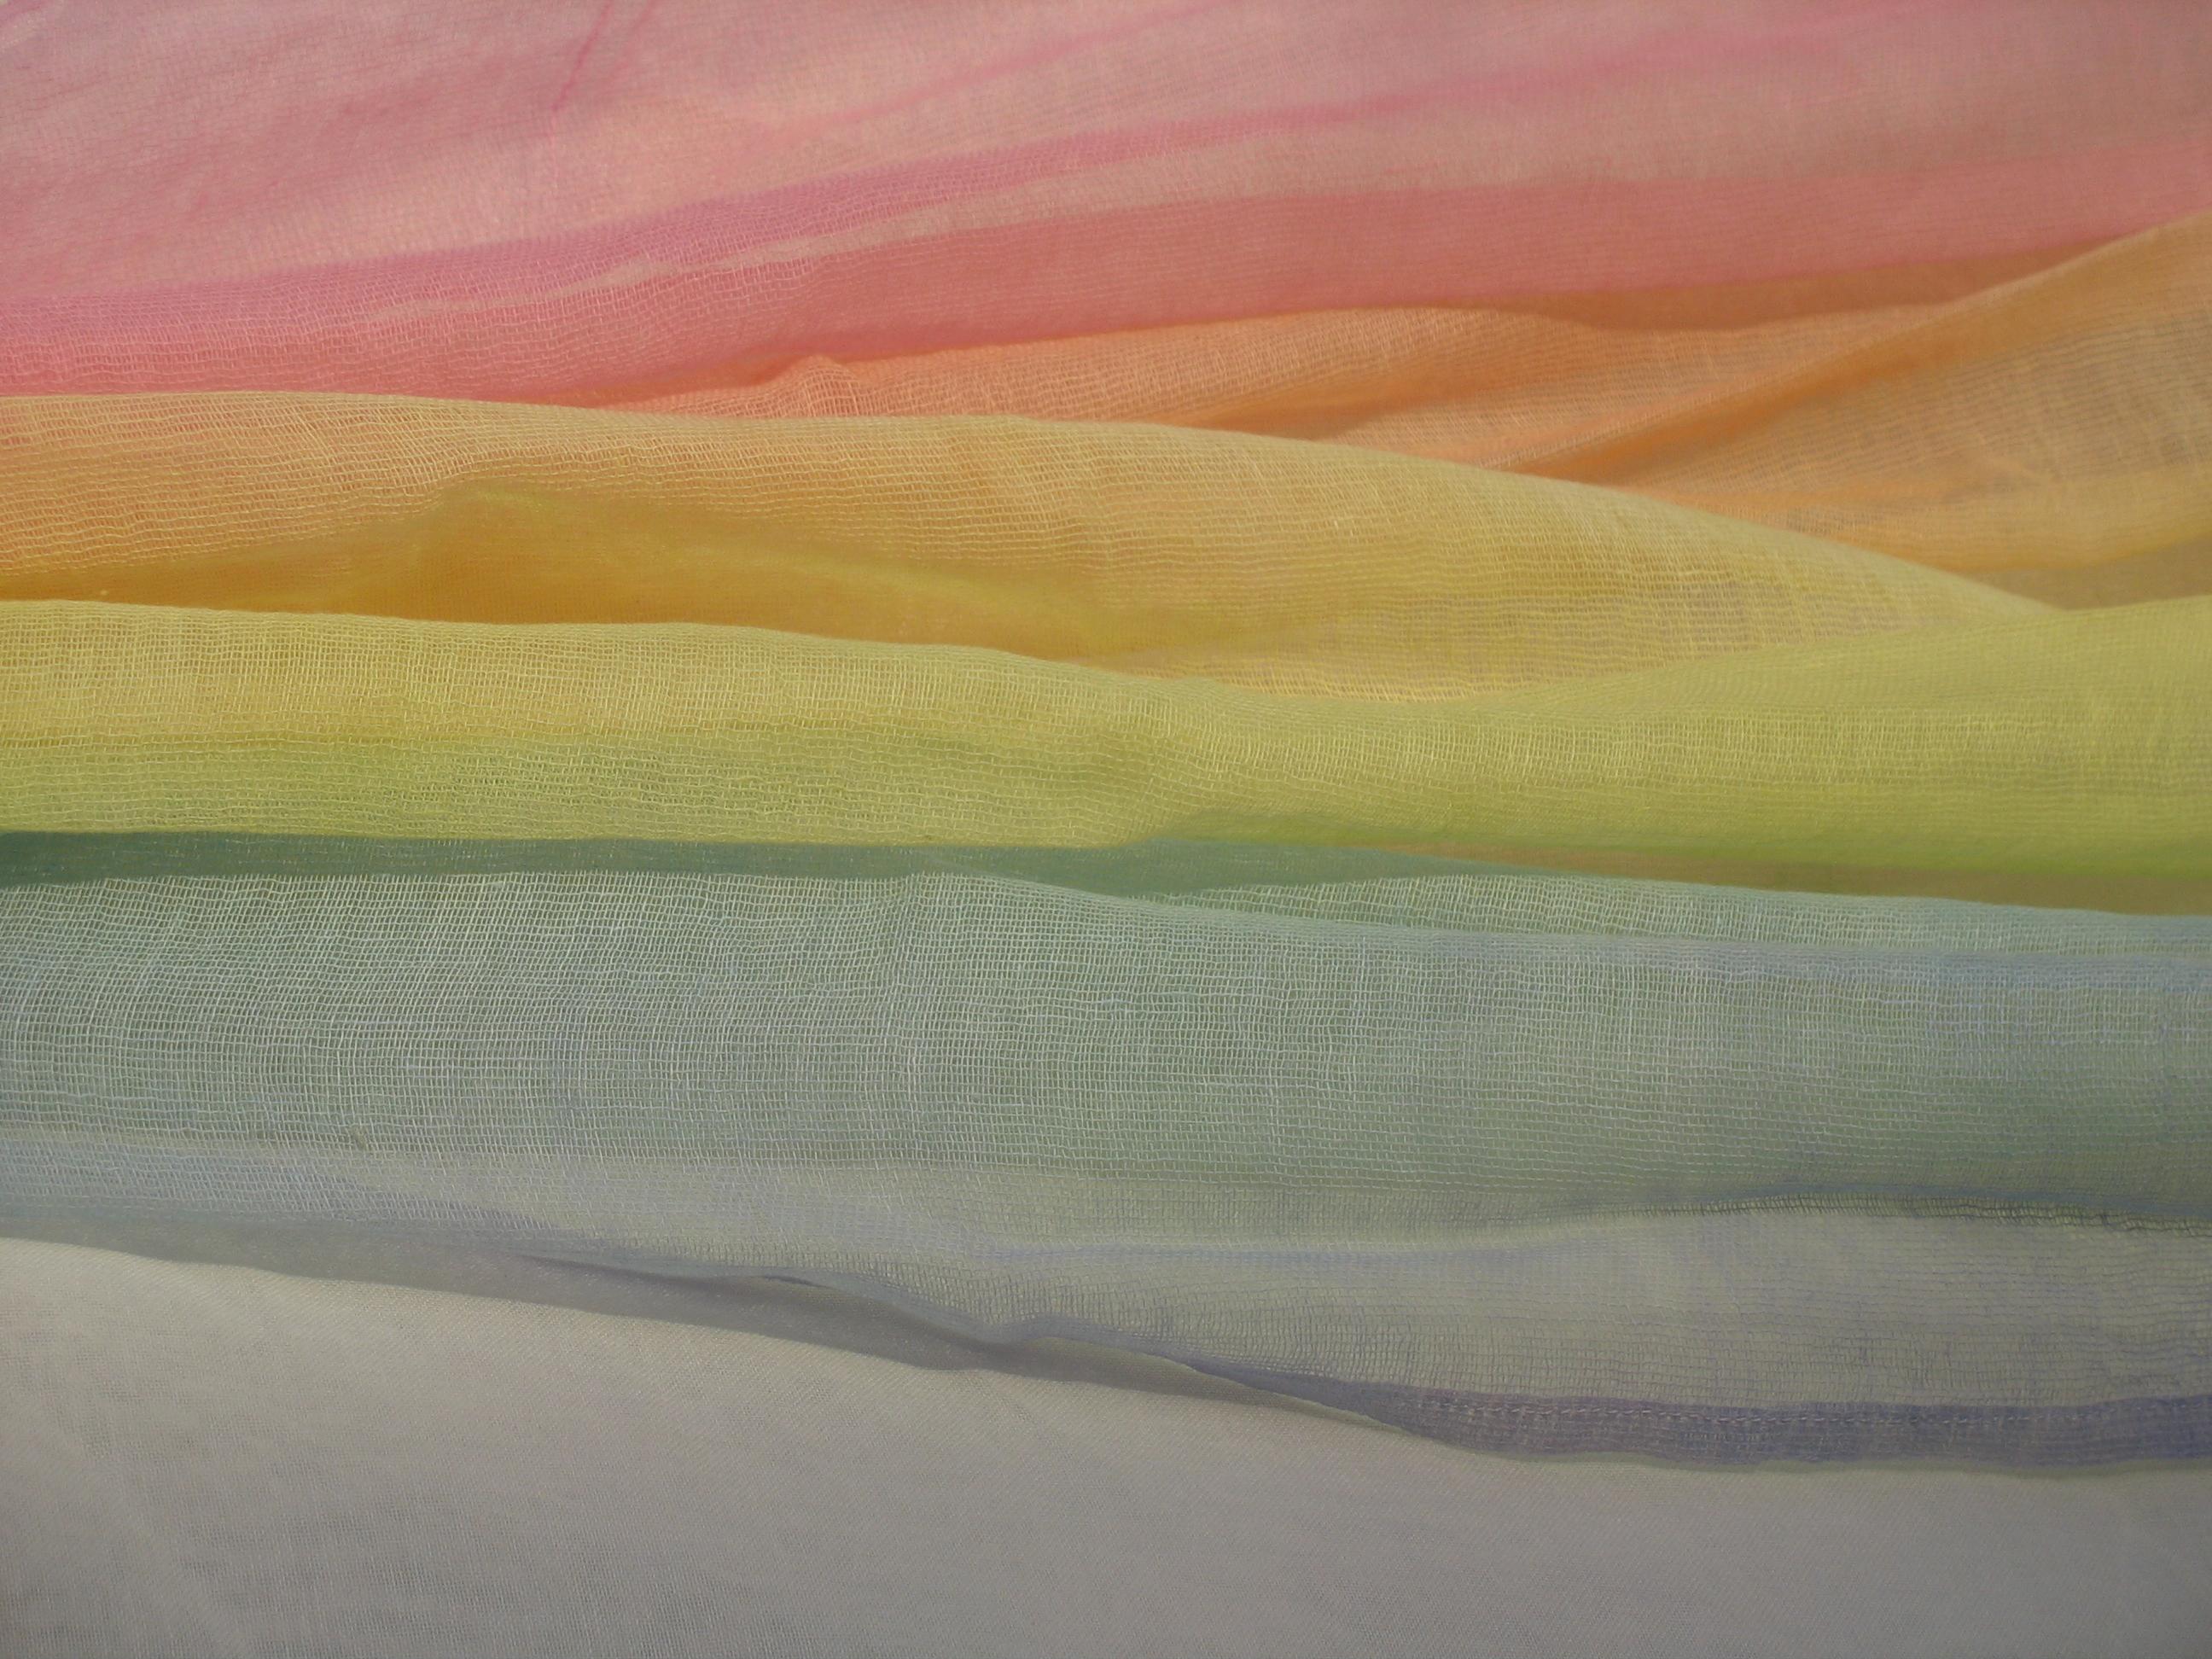 Regenbogen pastell pur